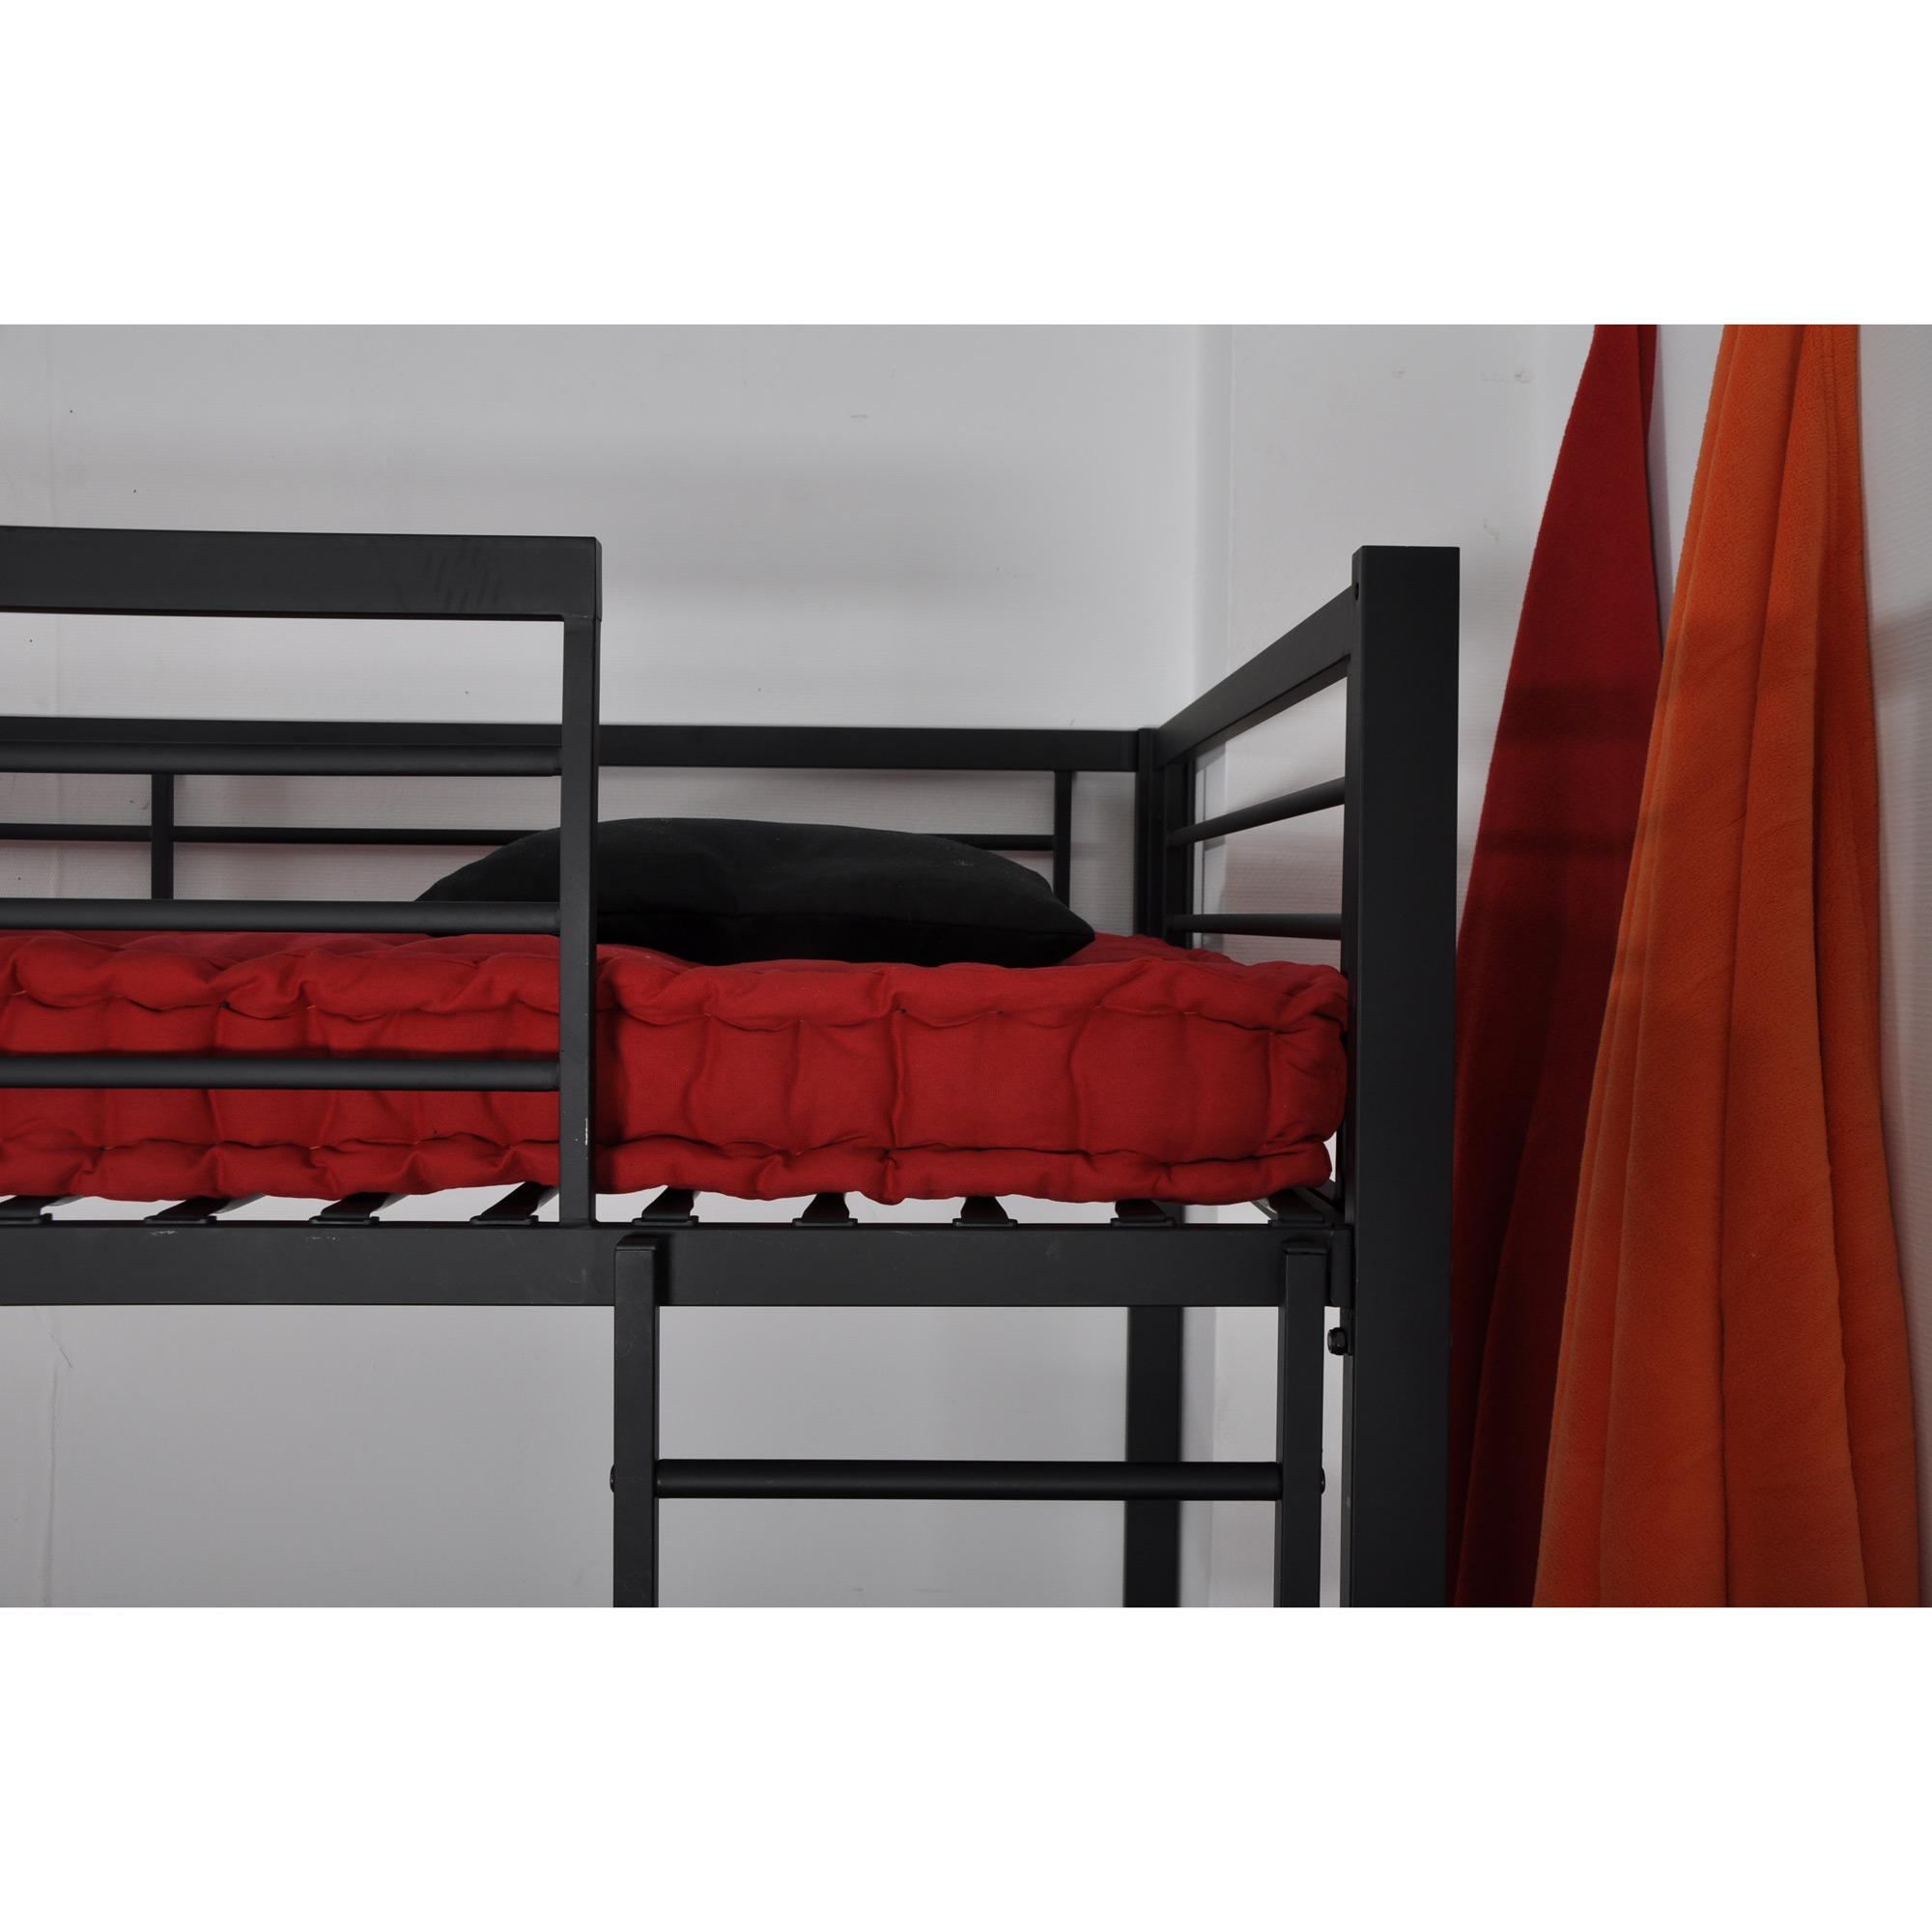 lit superpos urbanmezz grafik 90 x 190 cm comparer avec. Black Bedroom Furniture Sets. Home Design Ideas